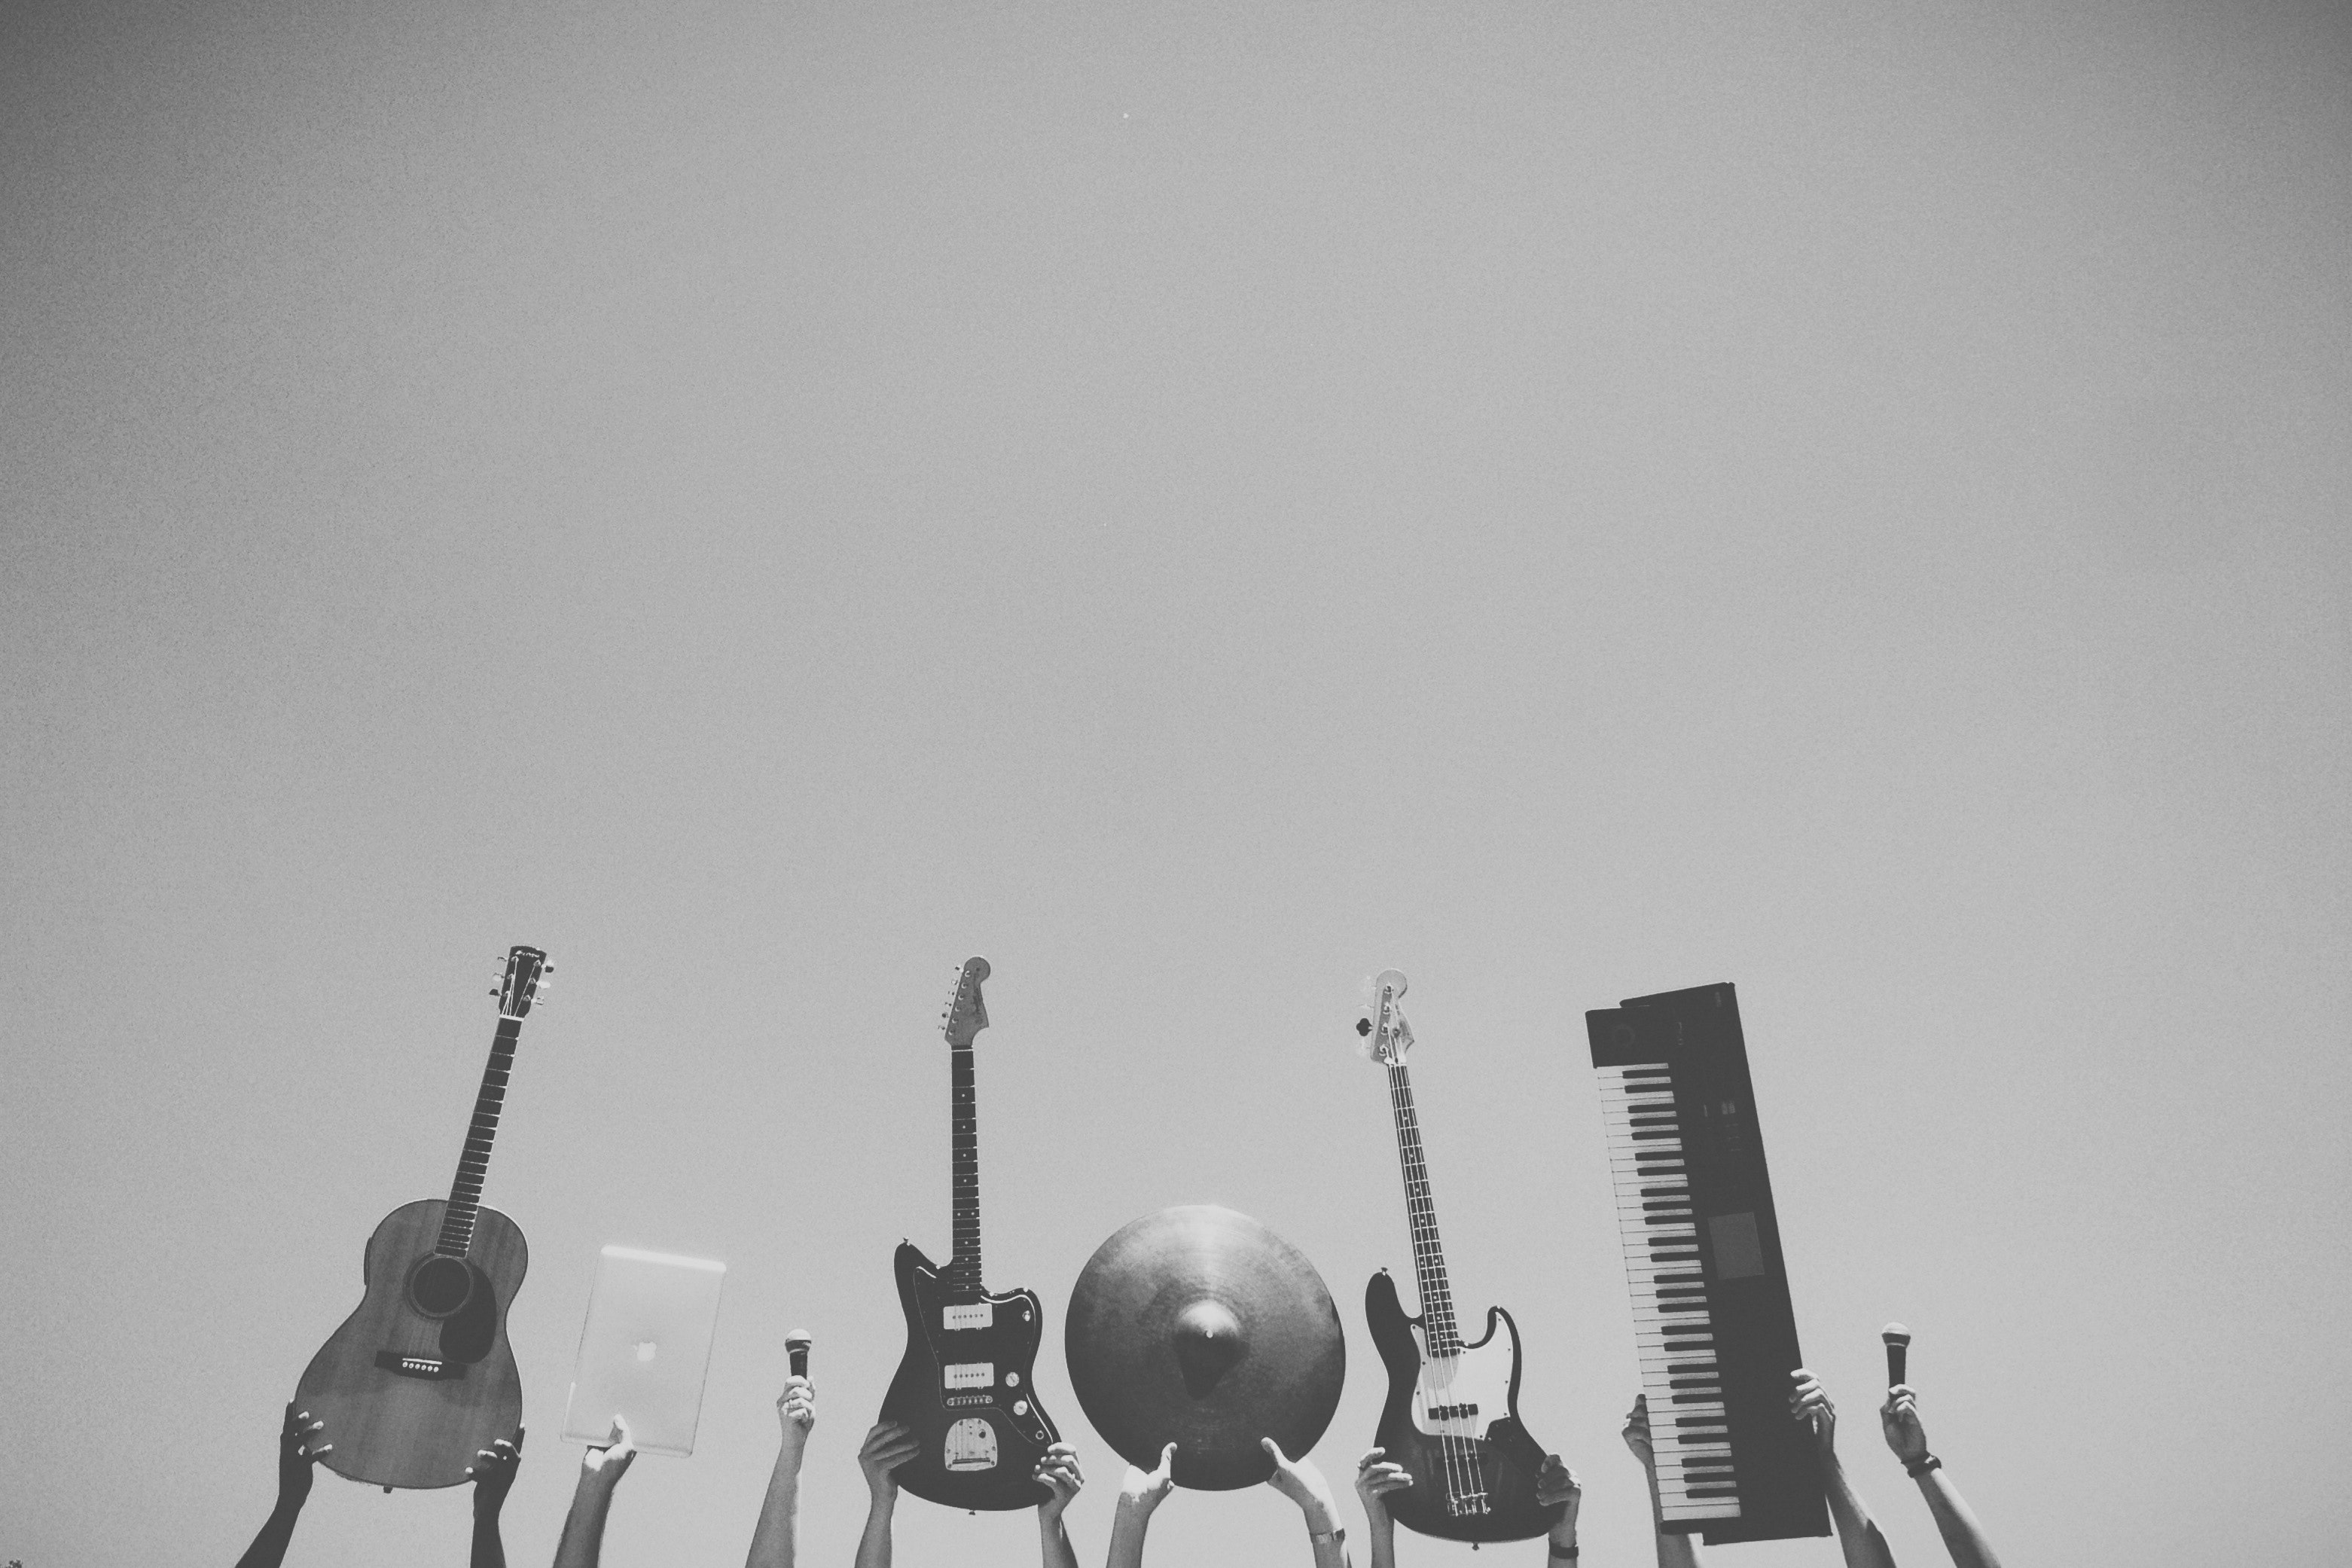 Opschudding in de Britse muziekindustrie